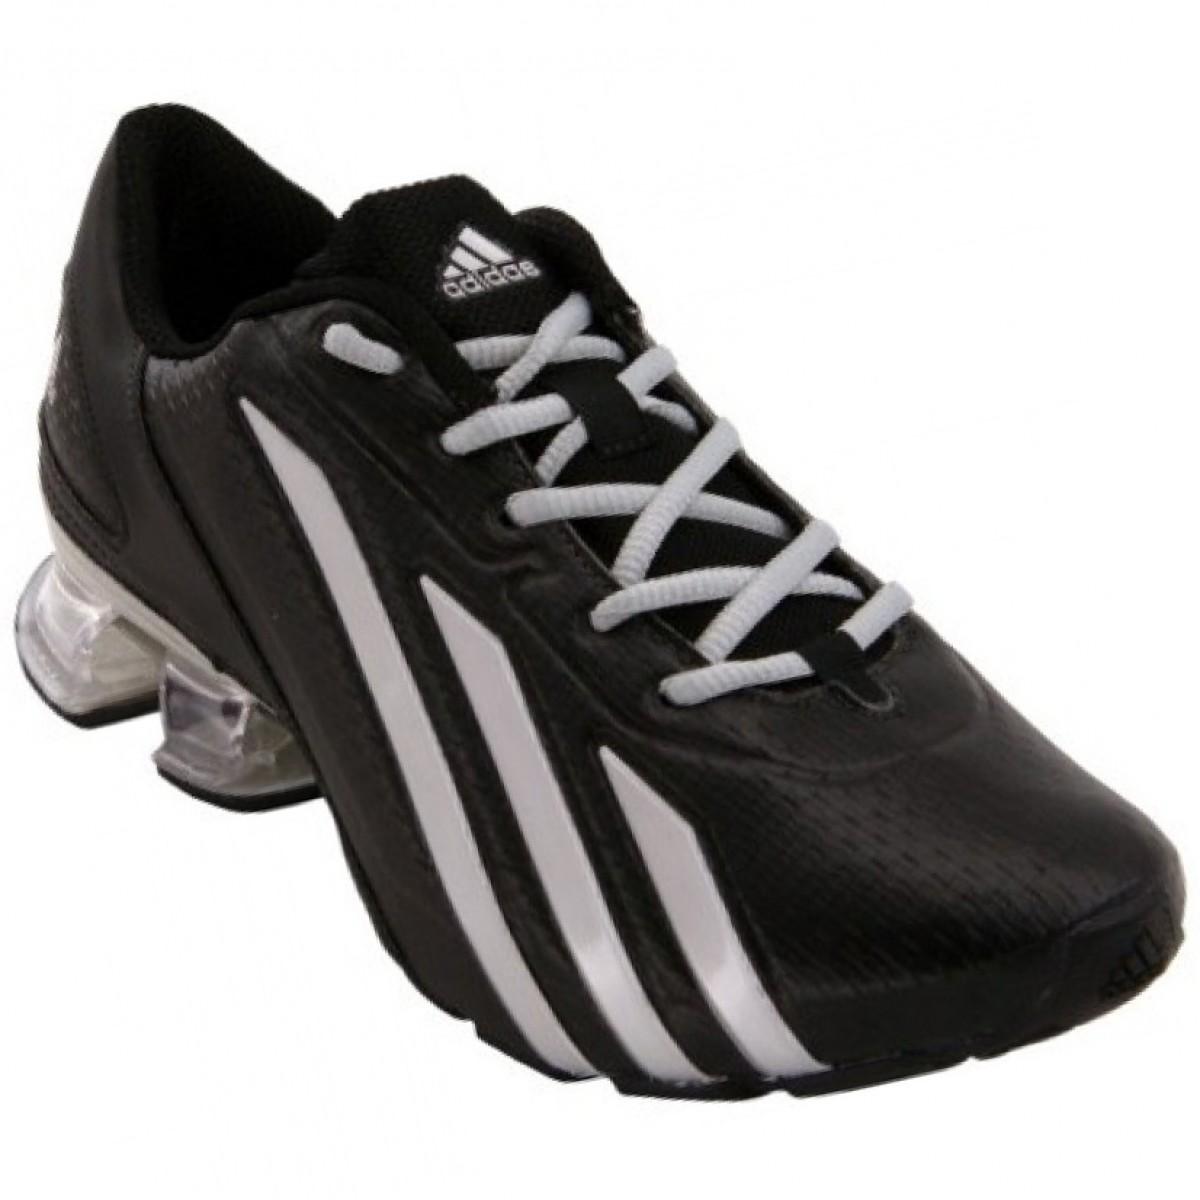 Tênis Masculino Adidas Meteor Preto Cinza - Compre Agora  77fa7de5a520d